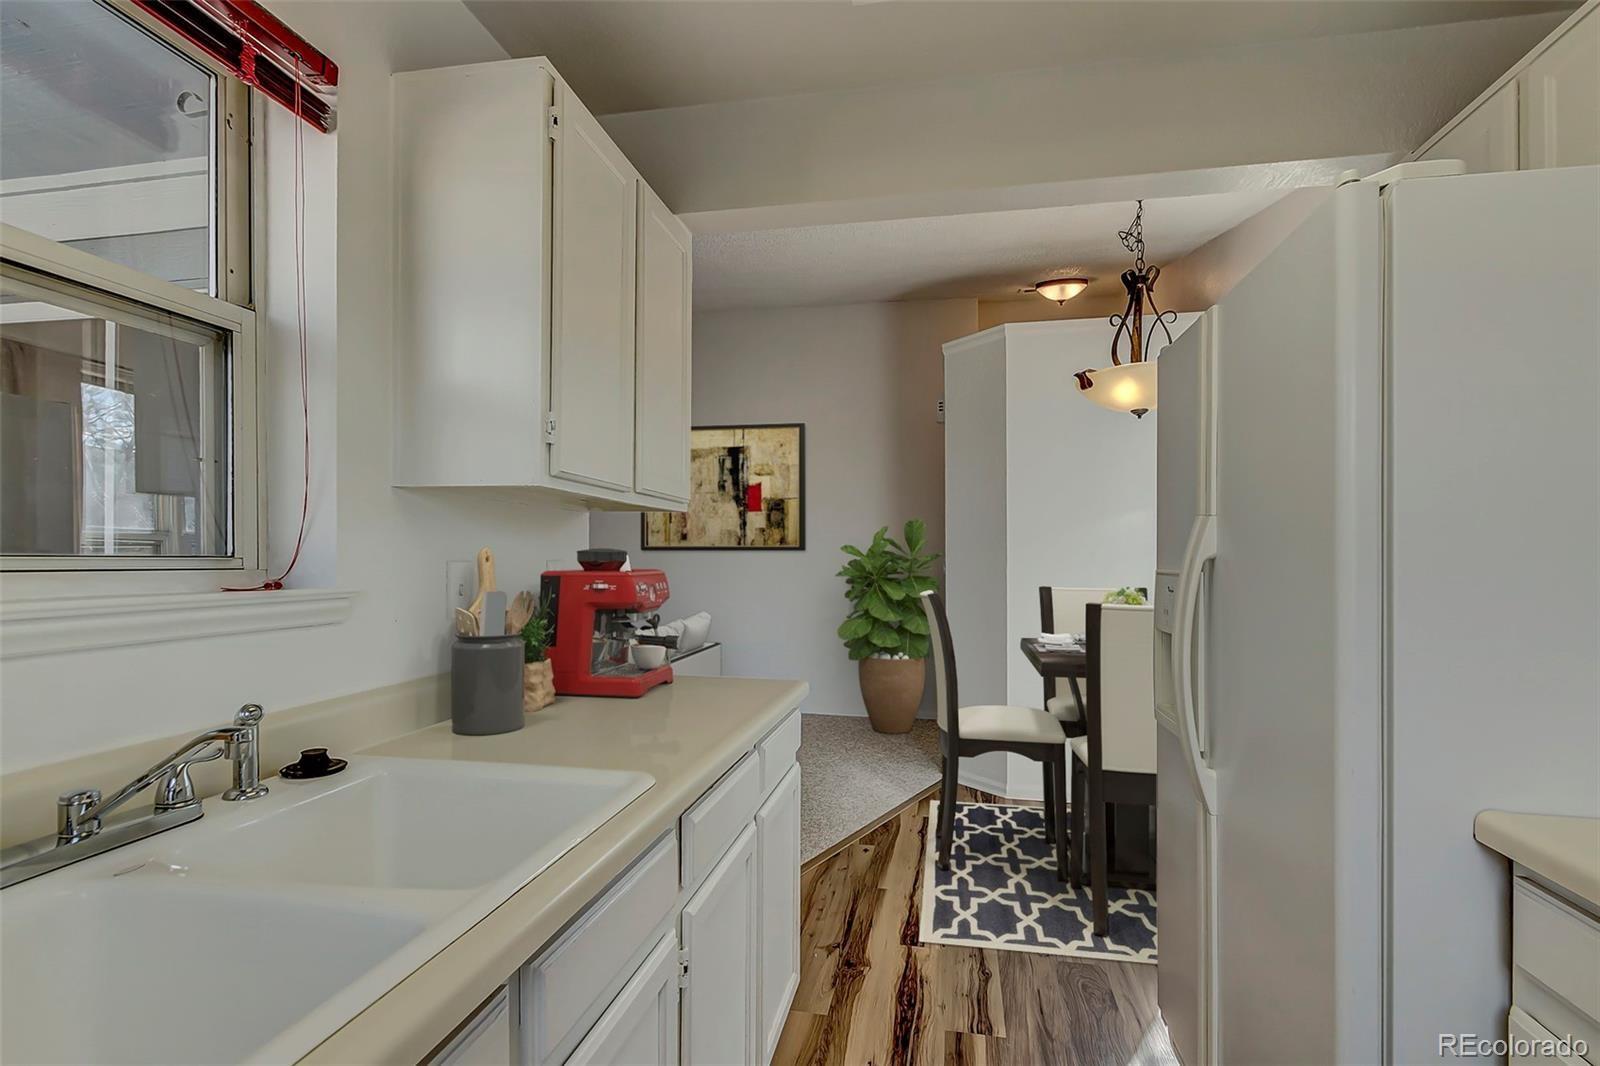 MLS# 3356784 - 6 - 8035 W Eastman Place #306, Lakewood, CO 80227